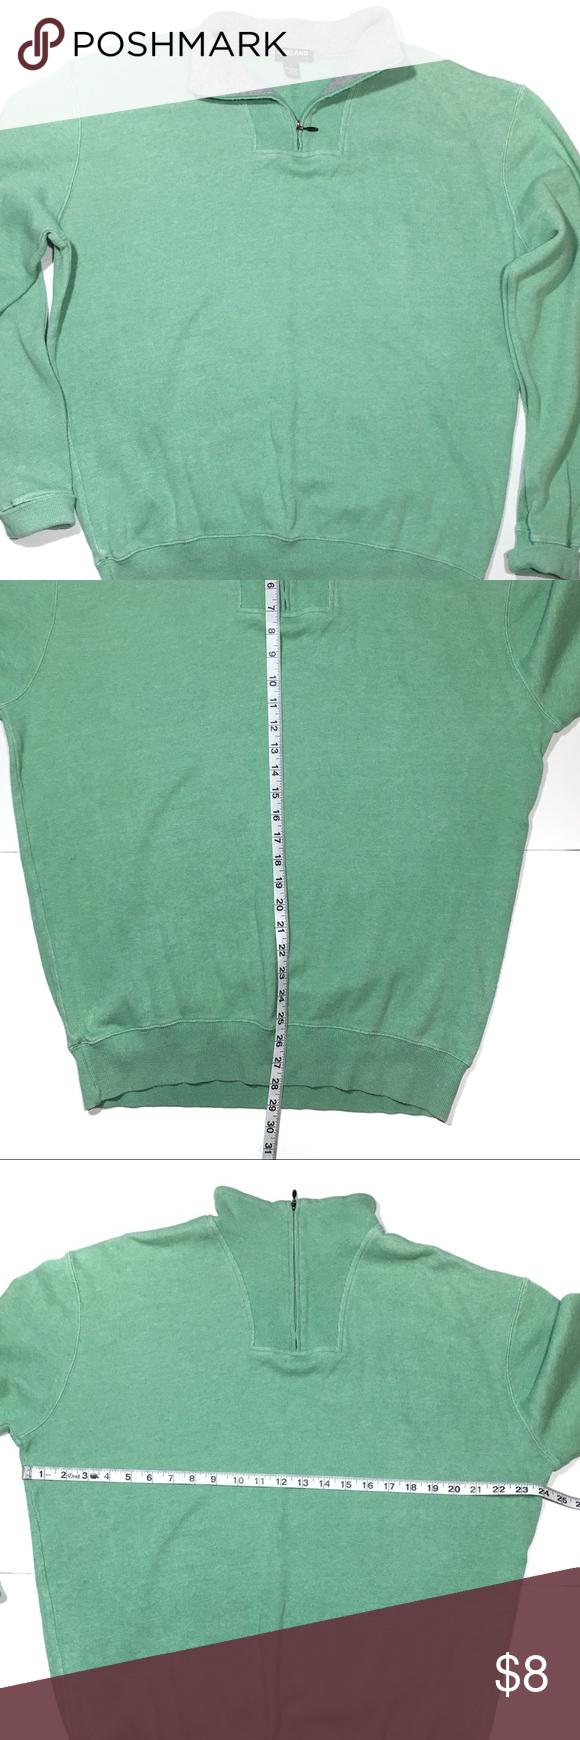 Large, Green Kirkland Mens Cotton Quarter Zip Pullover